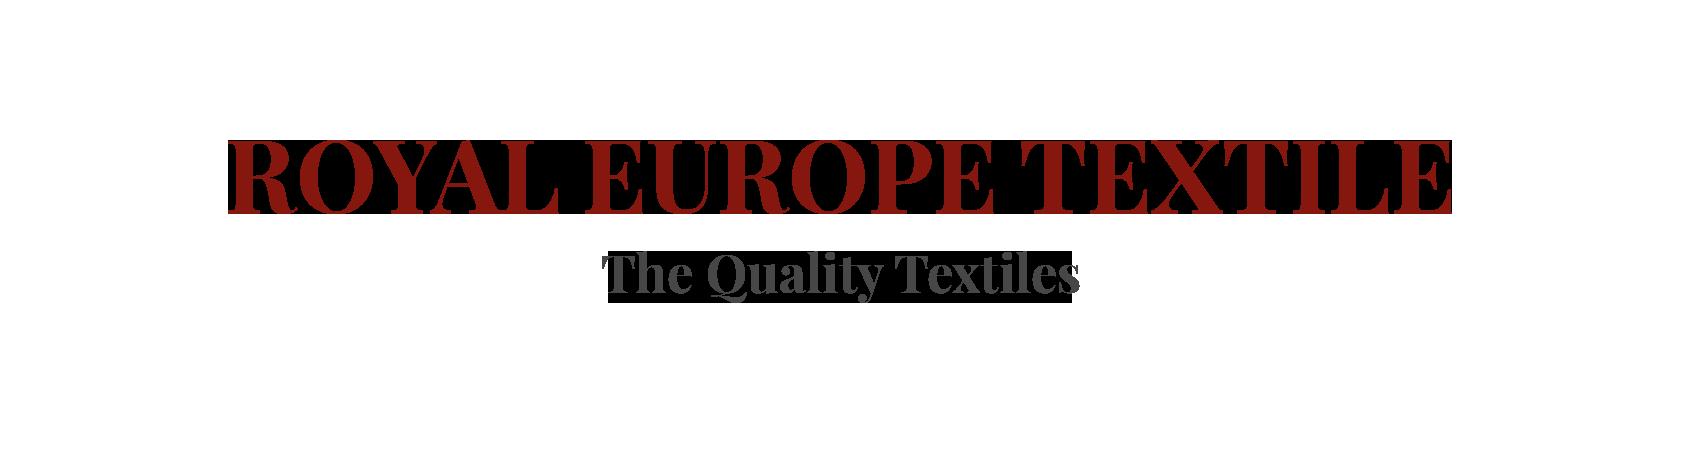 royal europe textile